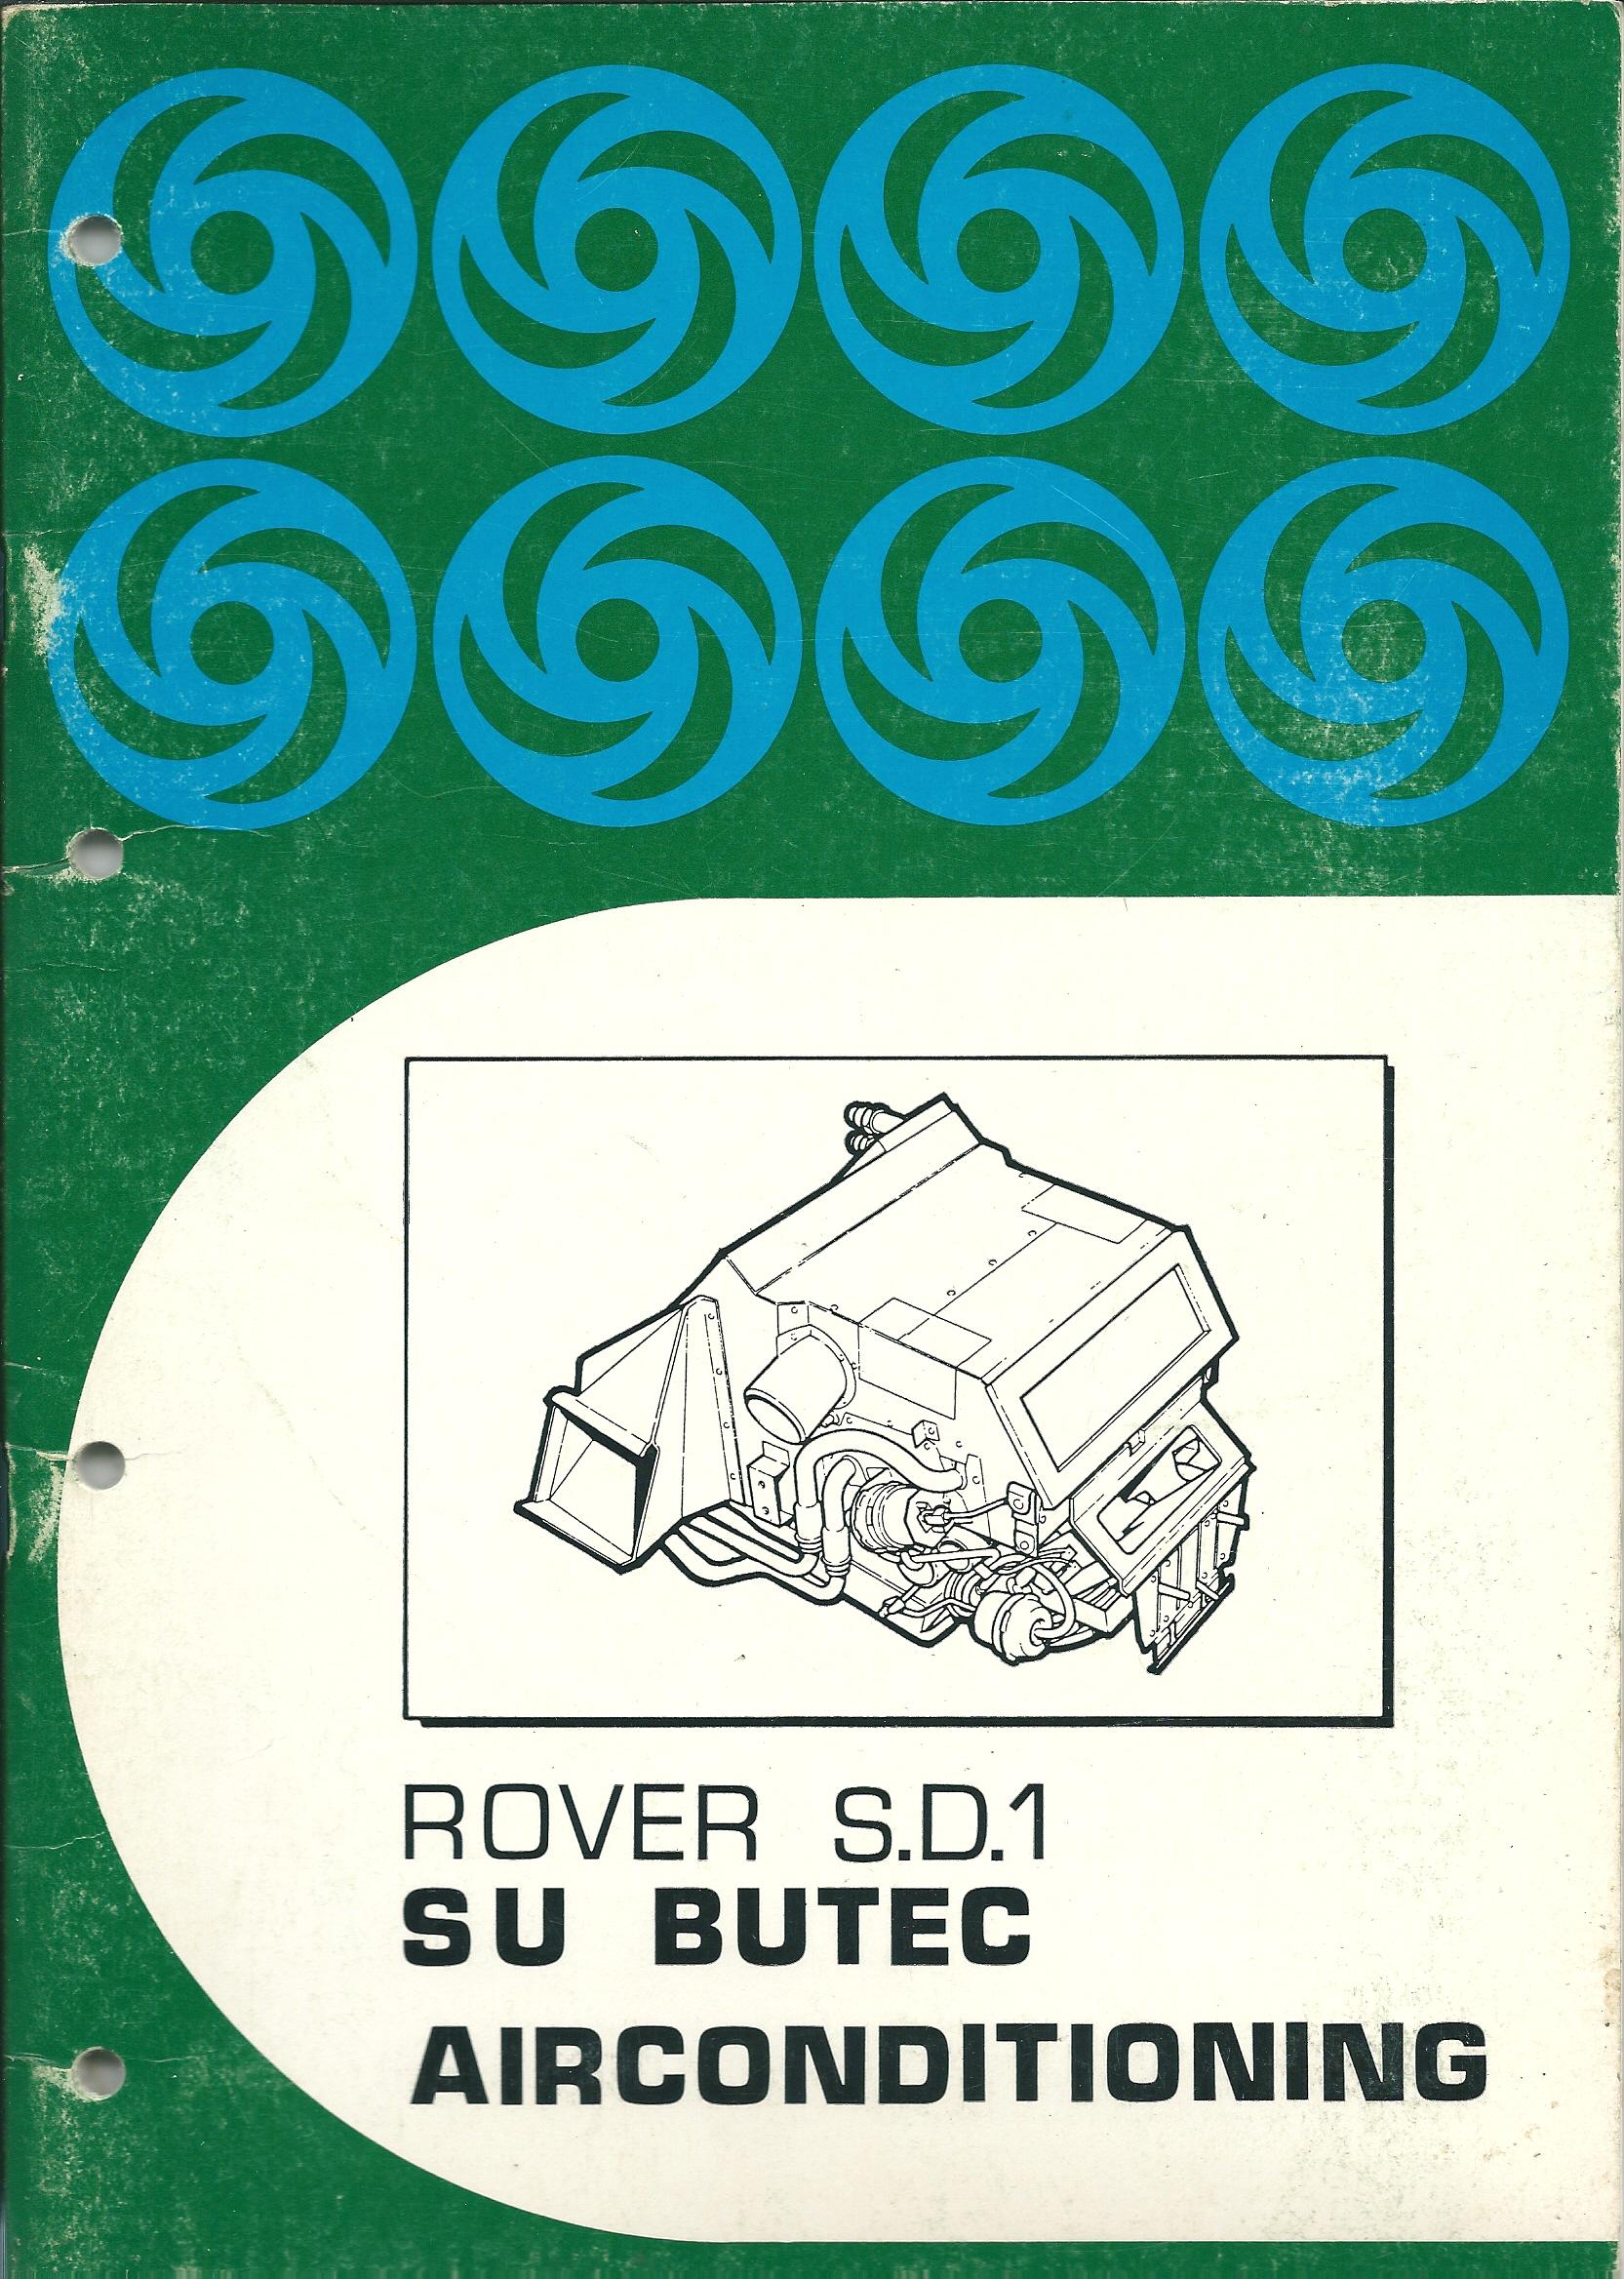 workshop manuals rover sd1 australia rh roversd1australia com